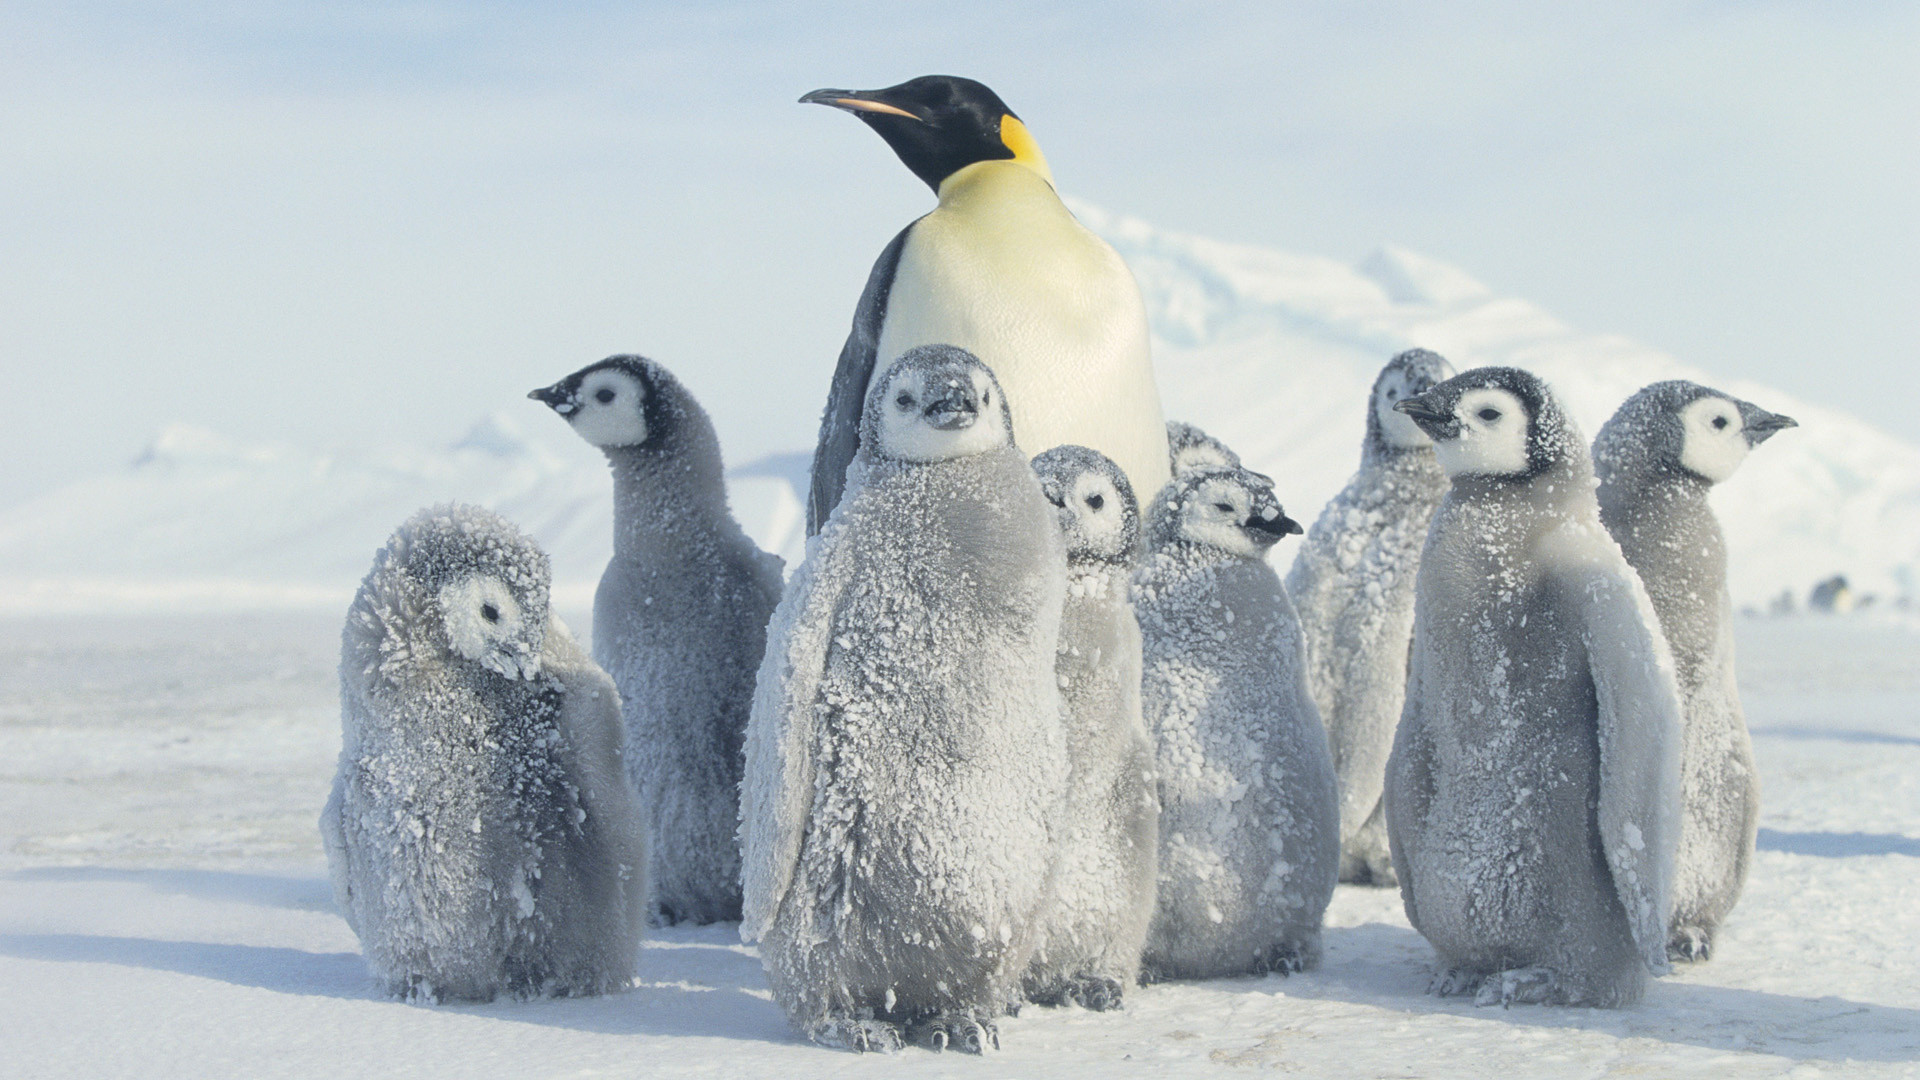 Penguin Wallpaper Fantastic Penguin Images K Ultra HD | HD Wallpapers |  Pinterest | Wallpaper